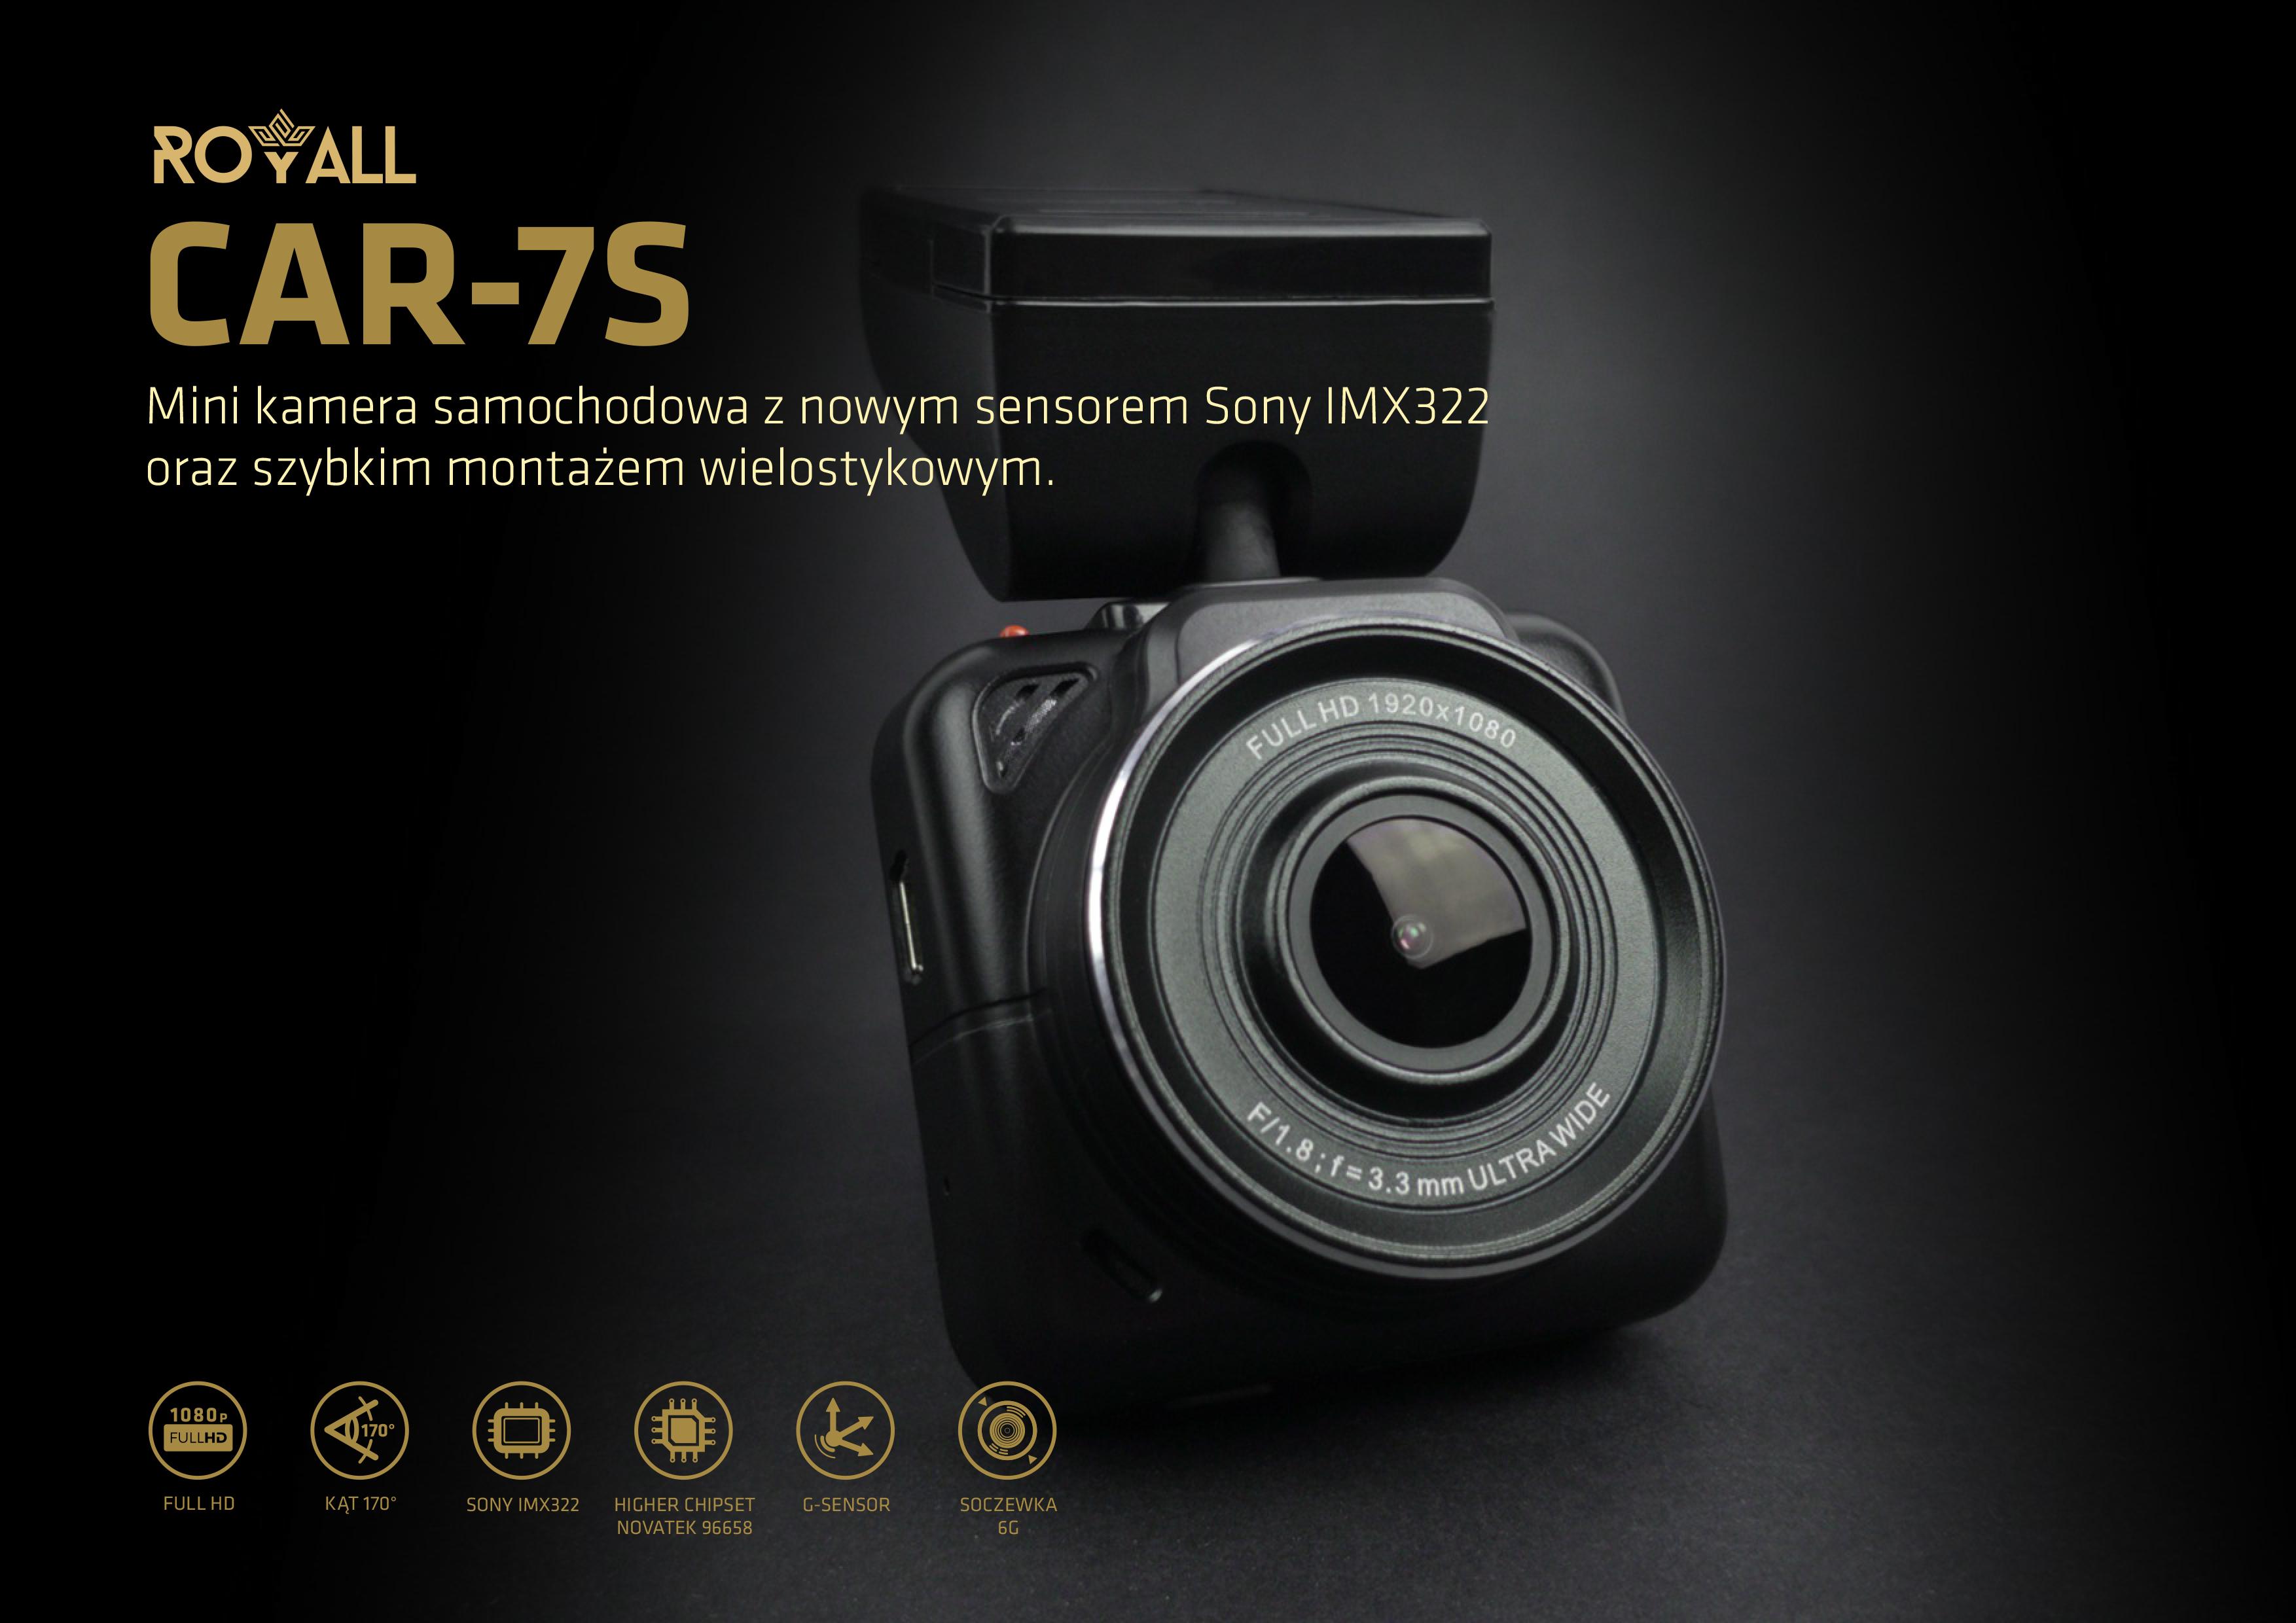 Royall Car-7S